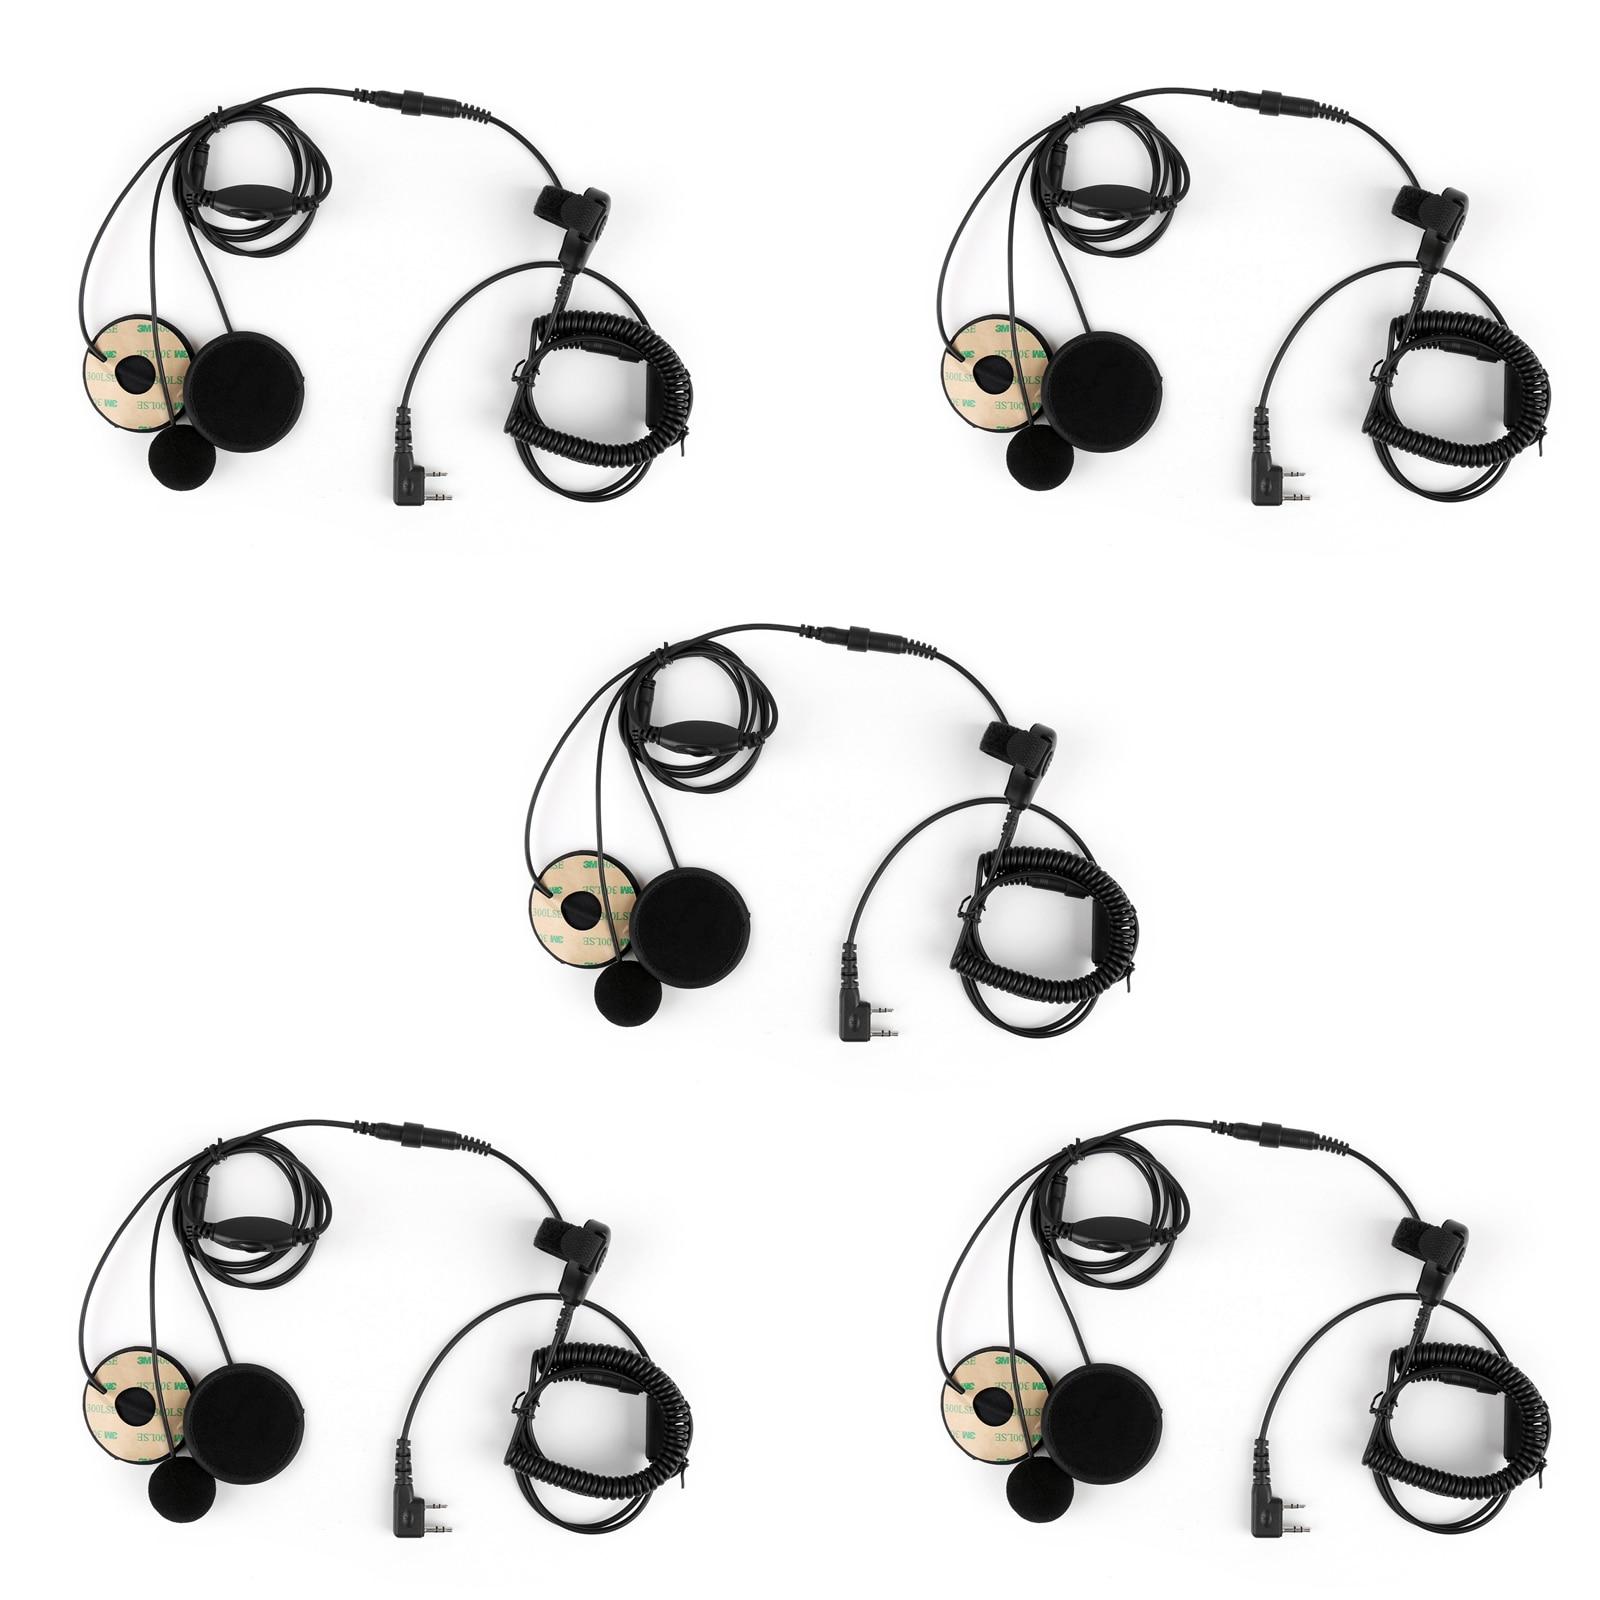 Artudatech 5Pcs 2 Pin Motorcycle Helmet Headset Adjustable Volume PTT For Kenwood TK3107 Radio